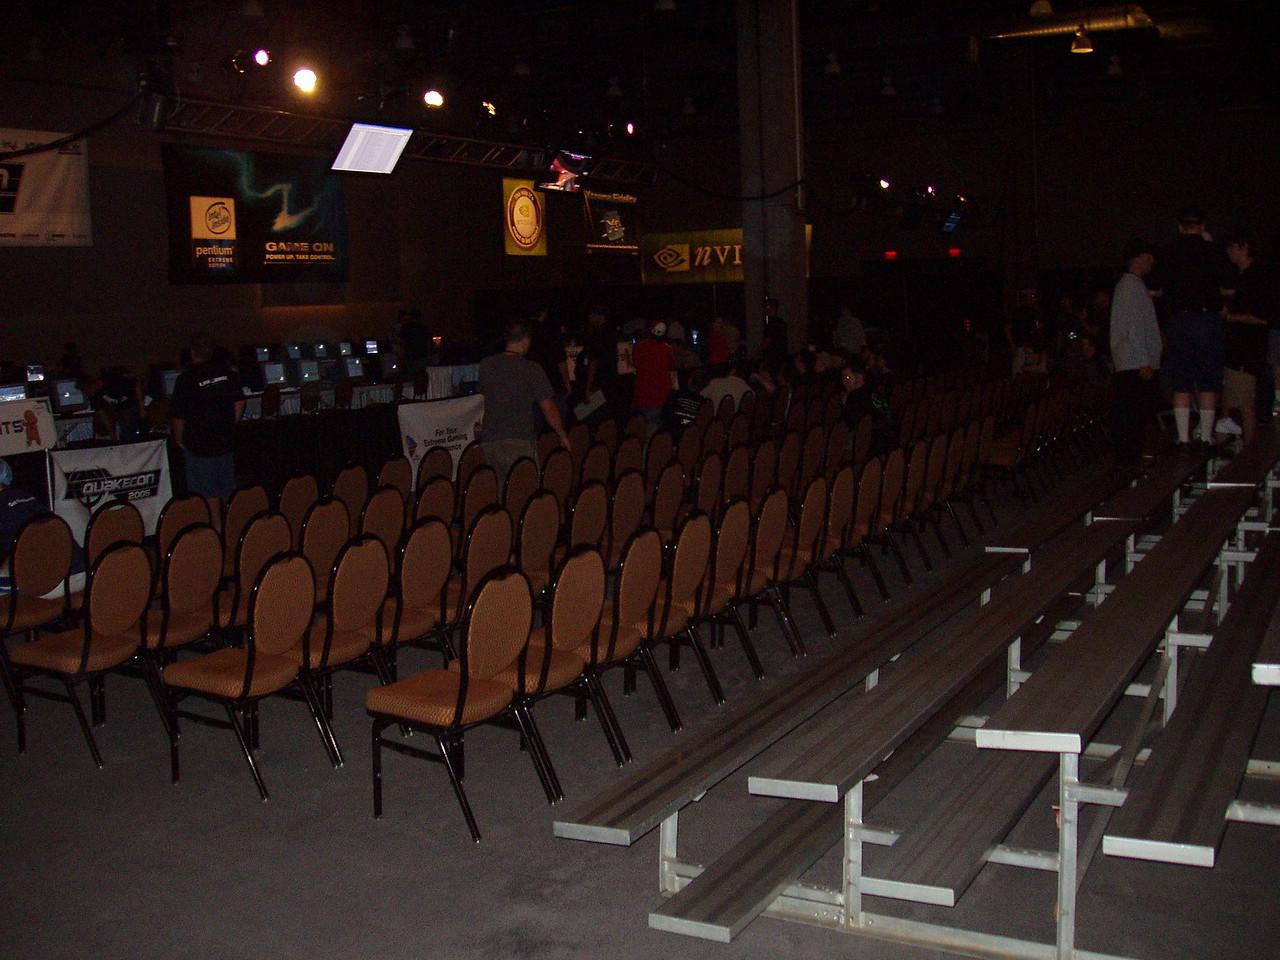 Qcon Day 1 Tournament Area